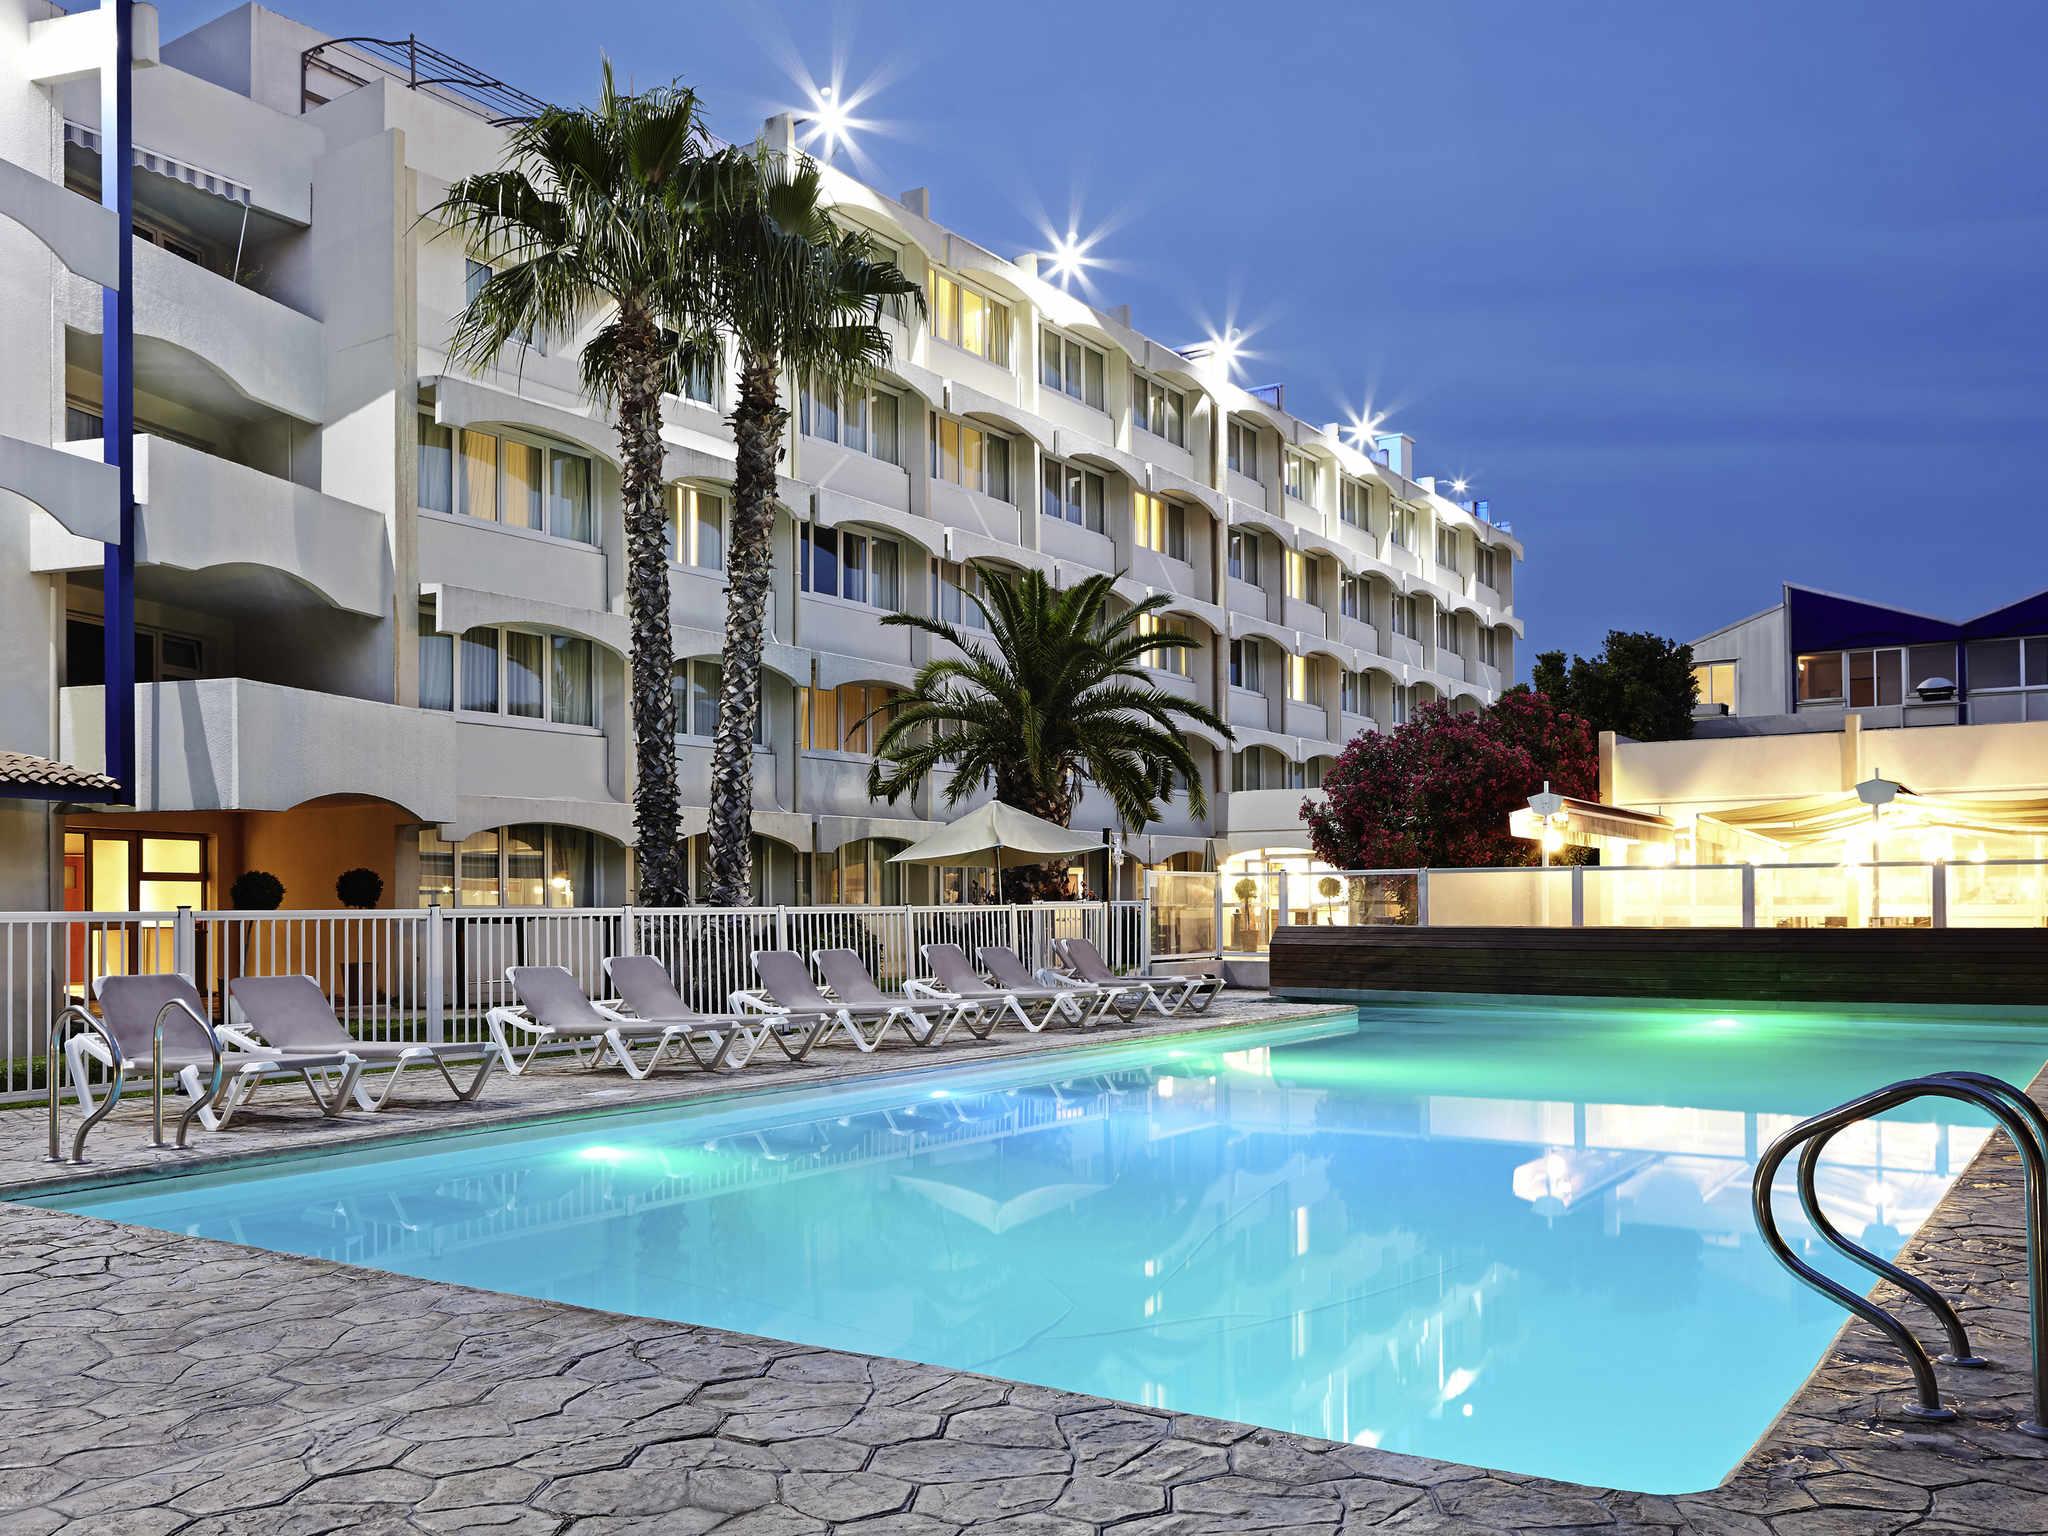 Hotel - Novotel Montpellier